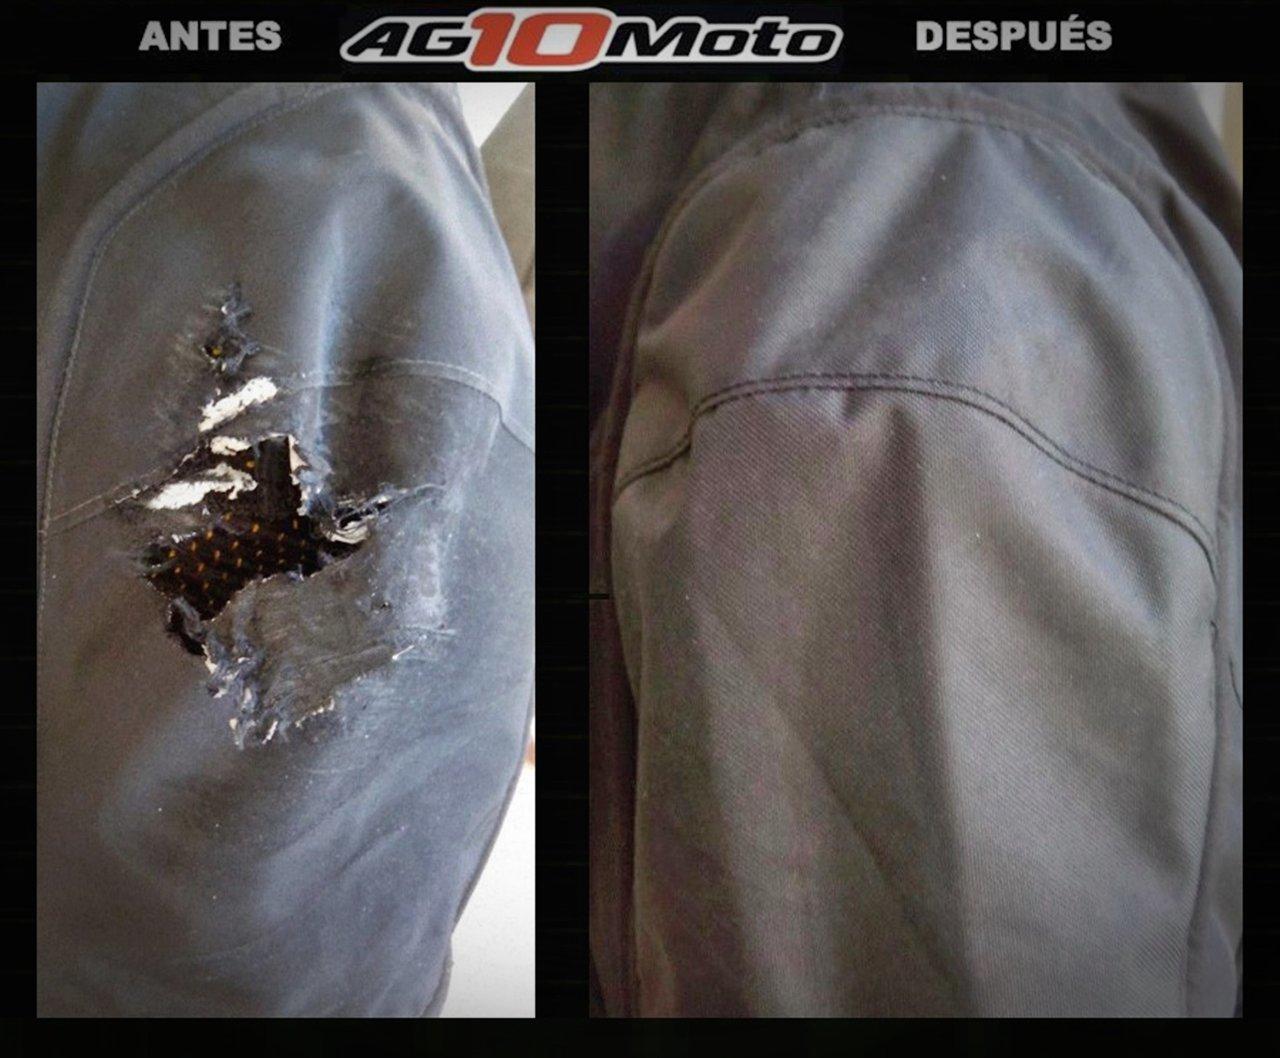 Foto de Reparación mono AG10Moto (7/8)